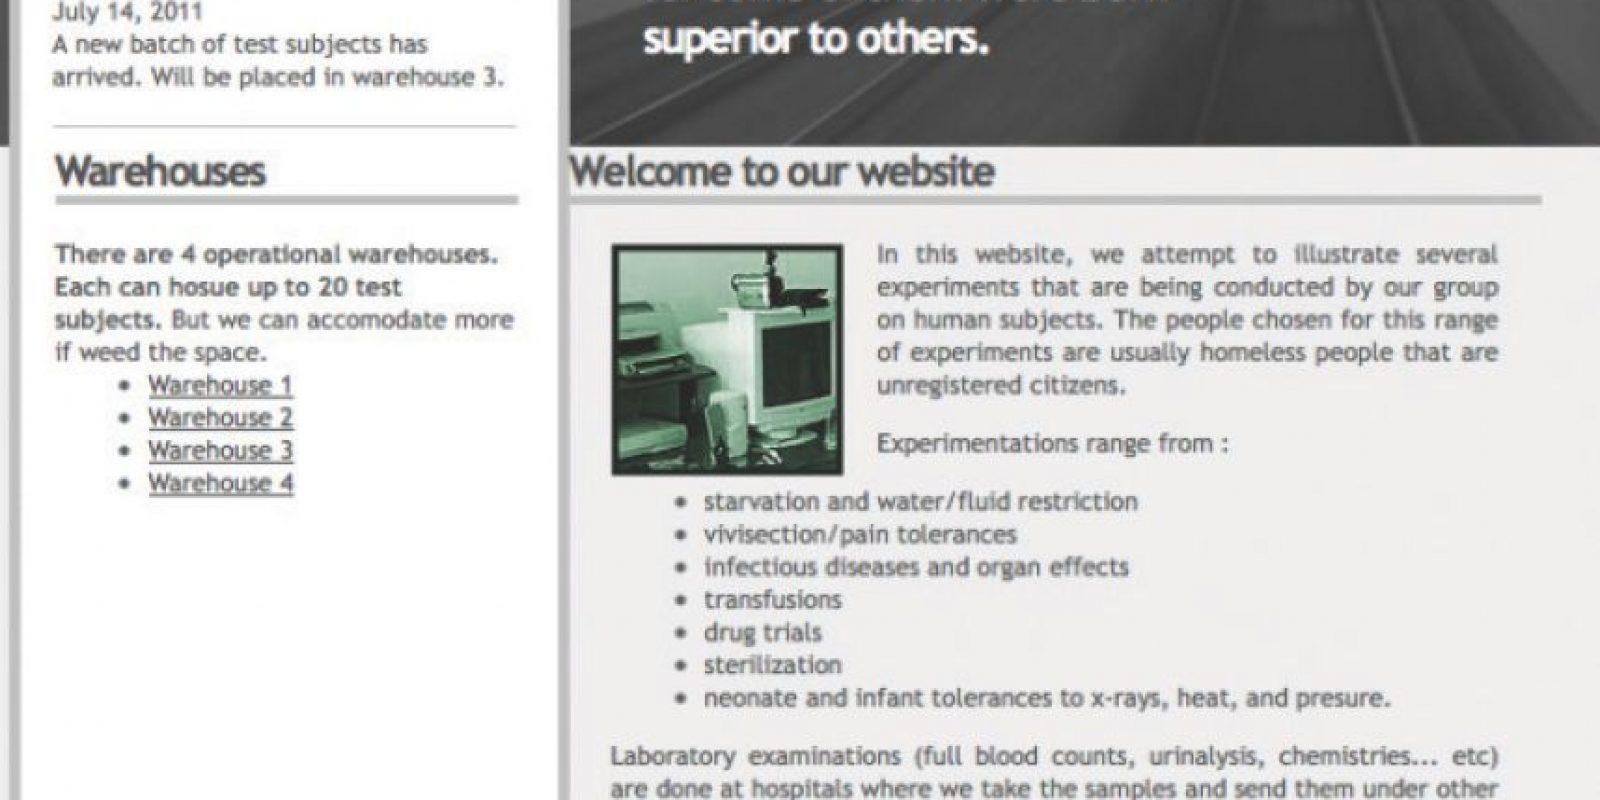 3. Experimentos humanos, principalmente con vagabundos Foto:Wikicommons